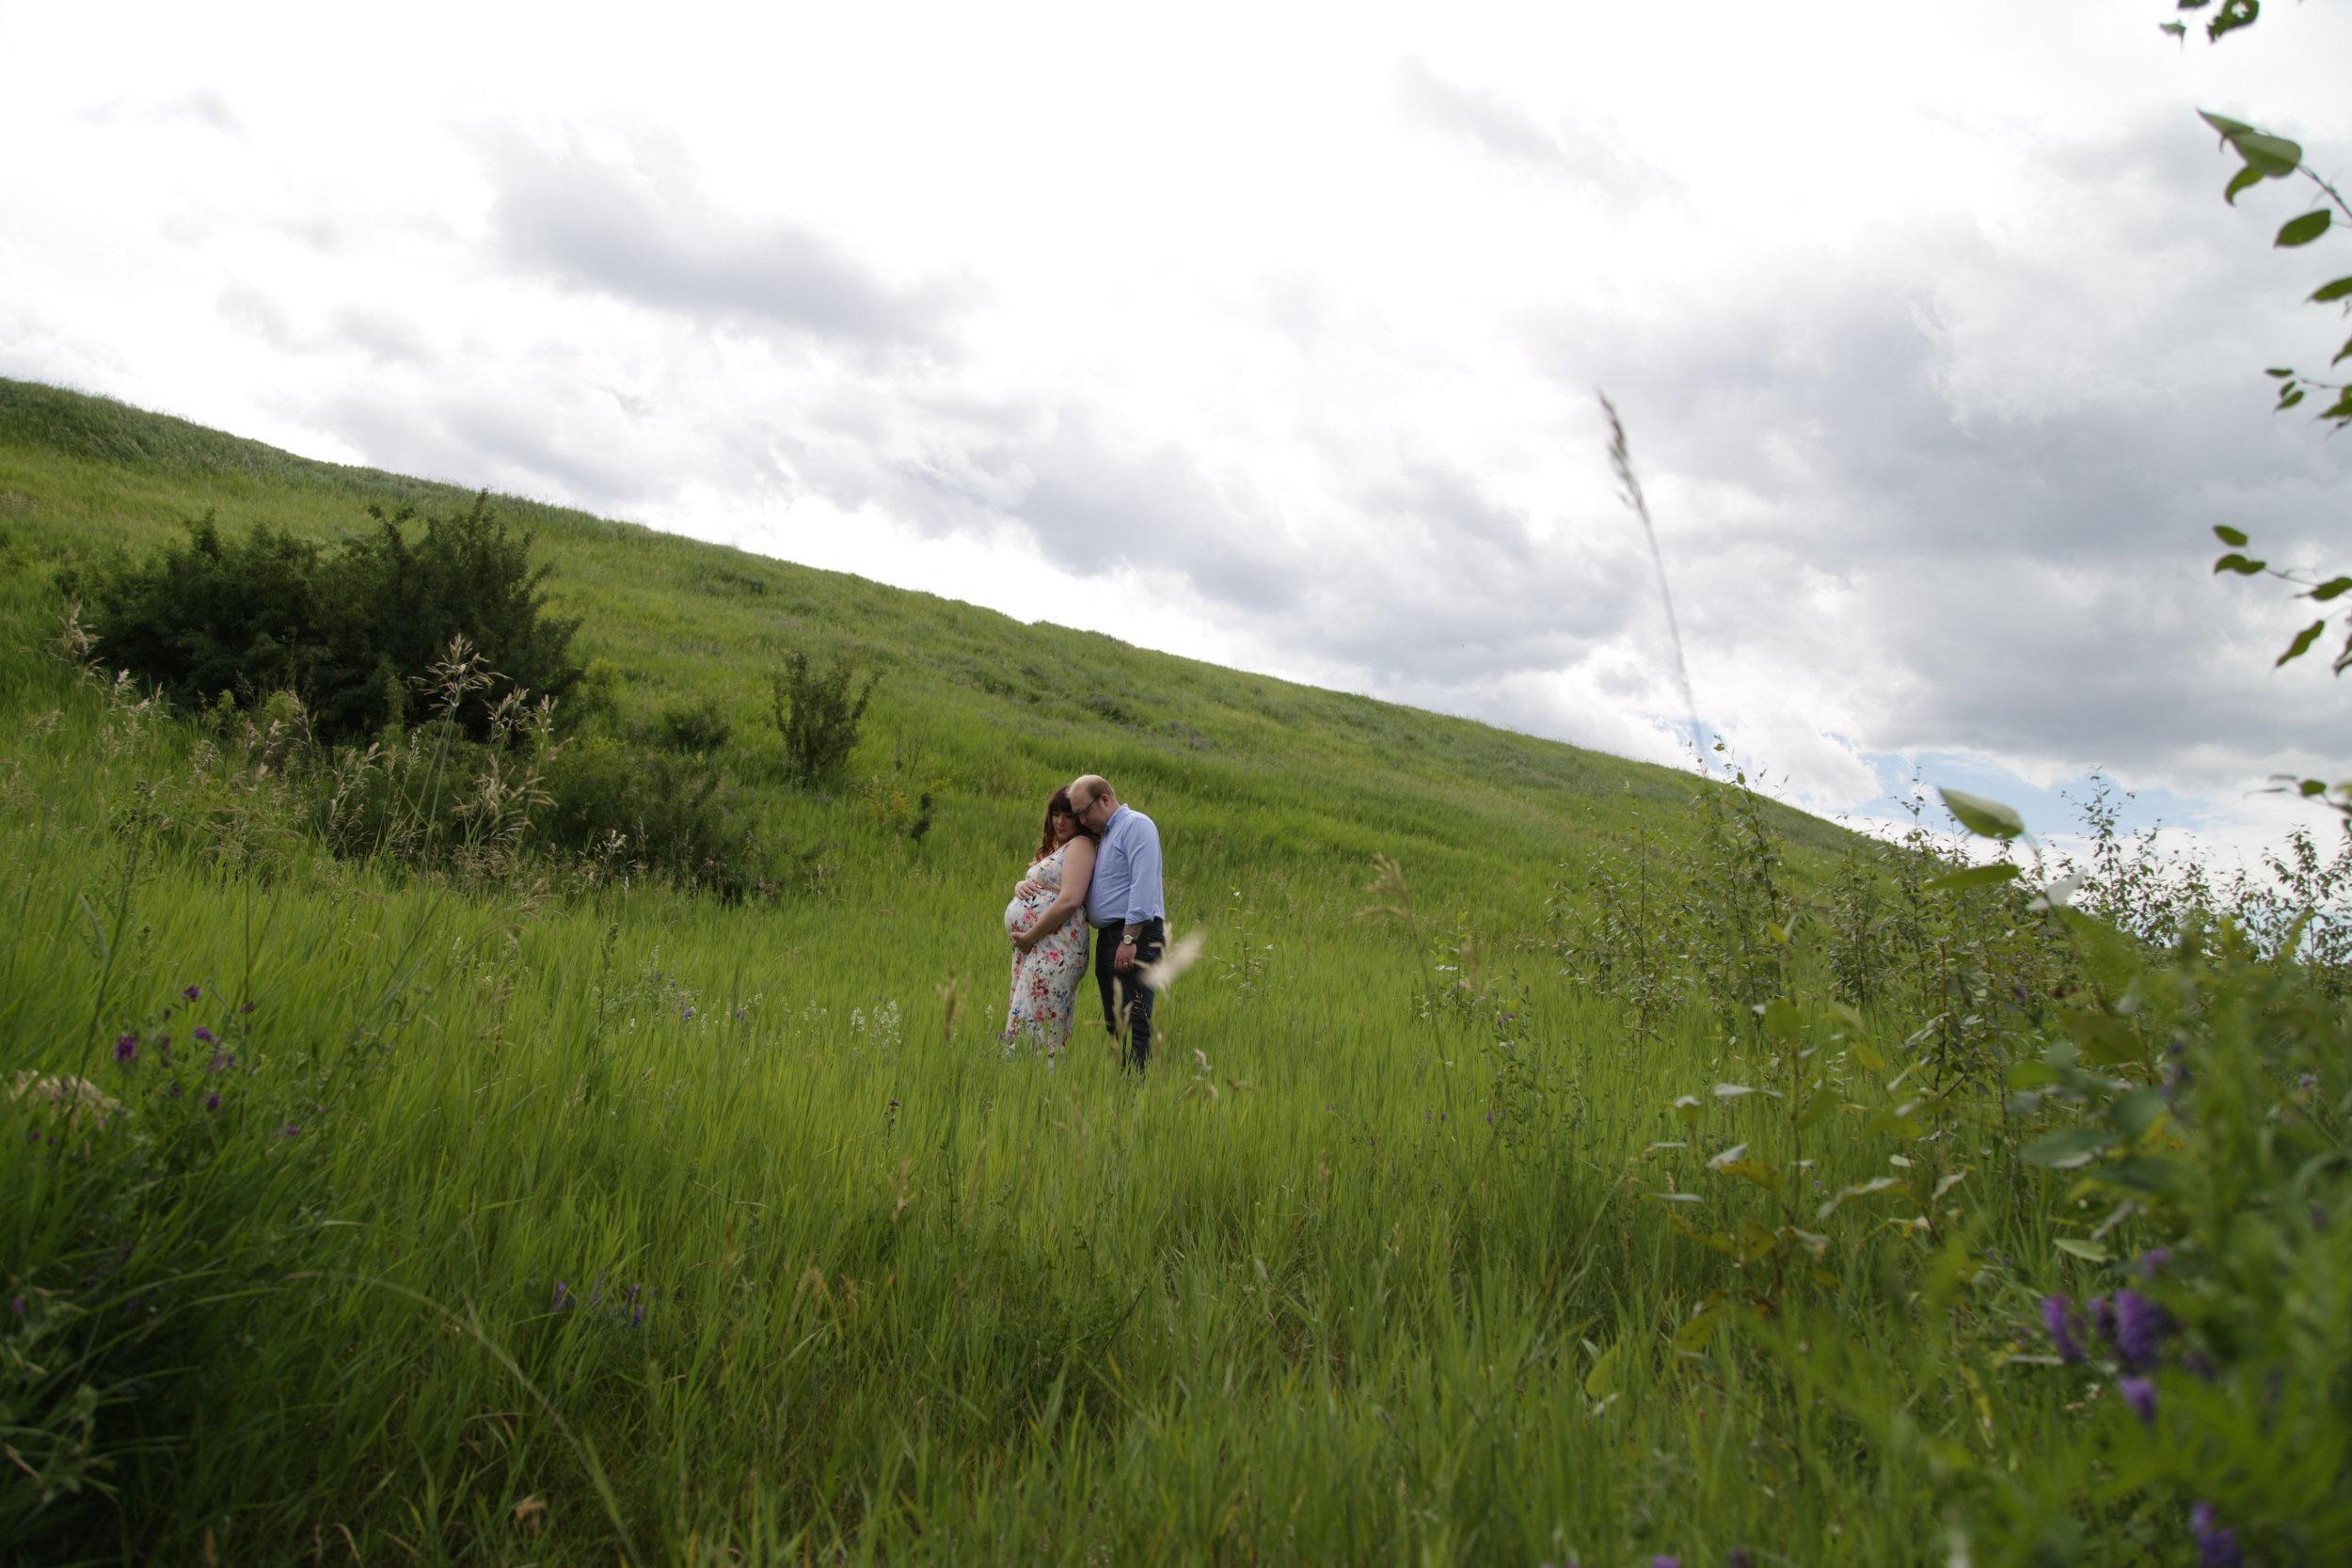 outdoor maternity photography | edmonton